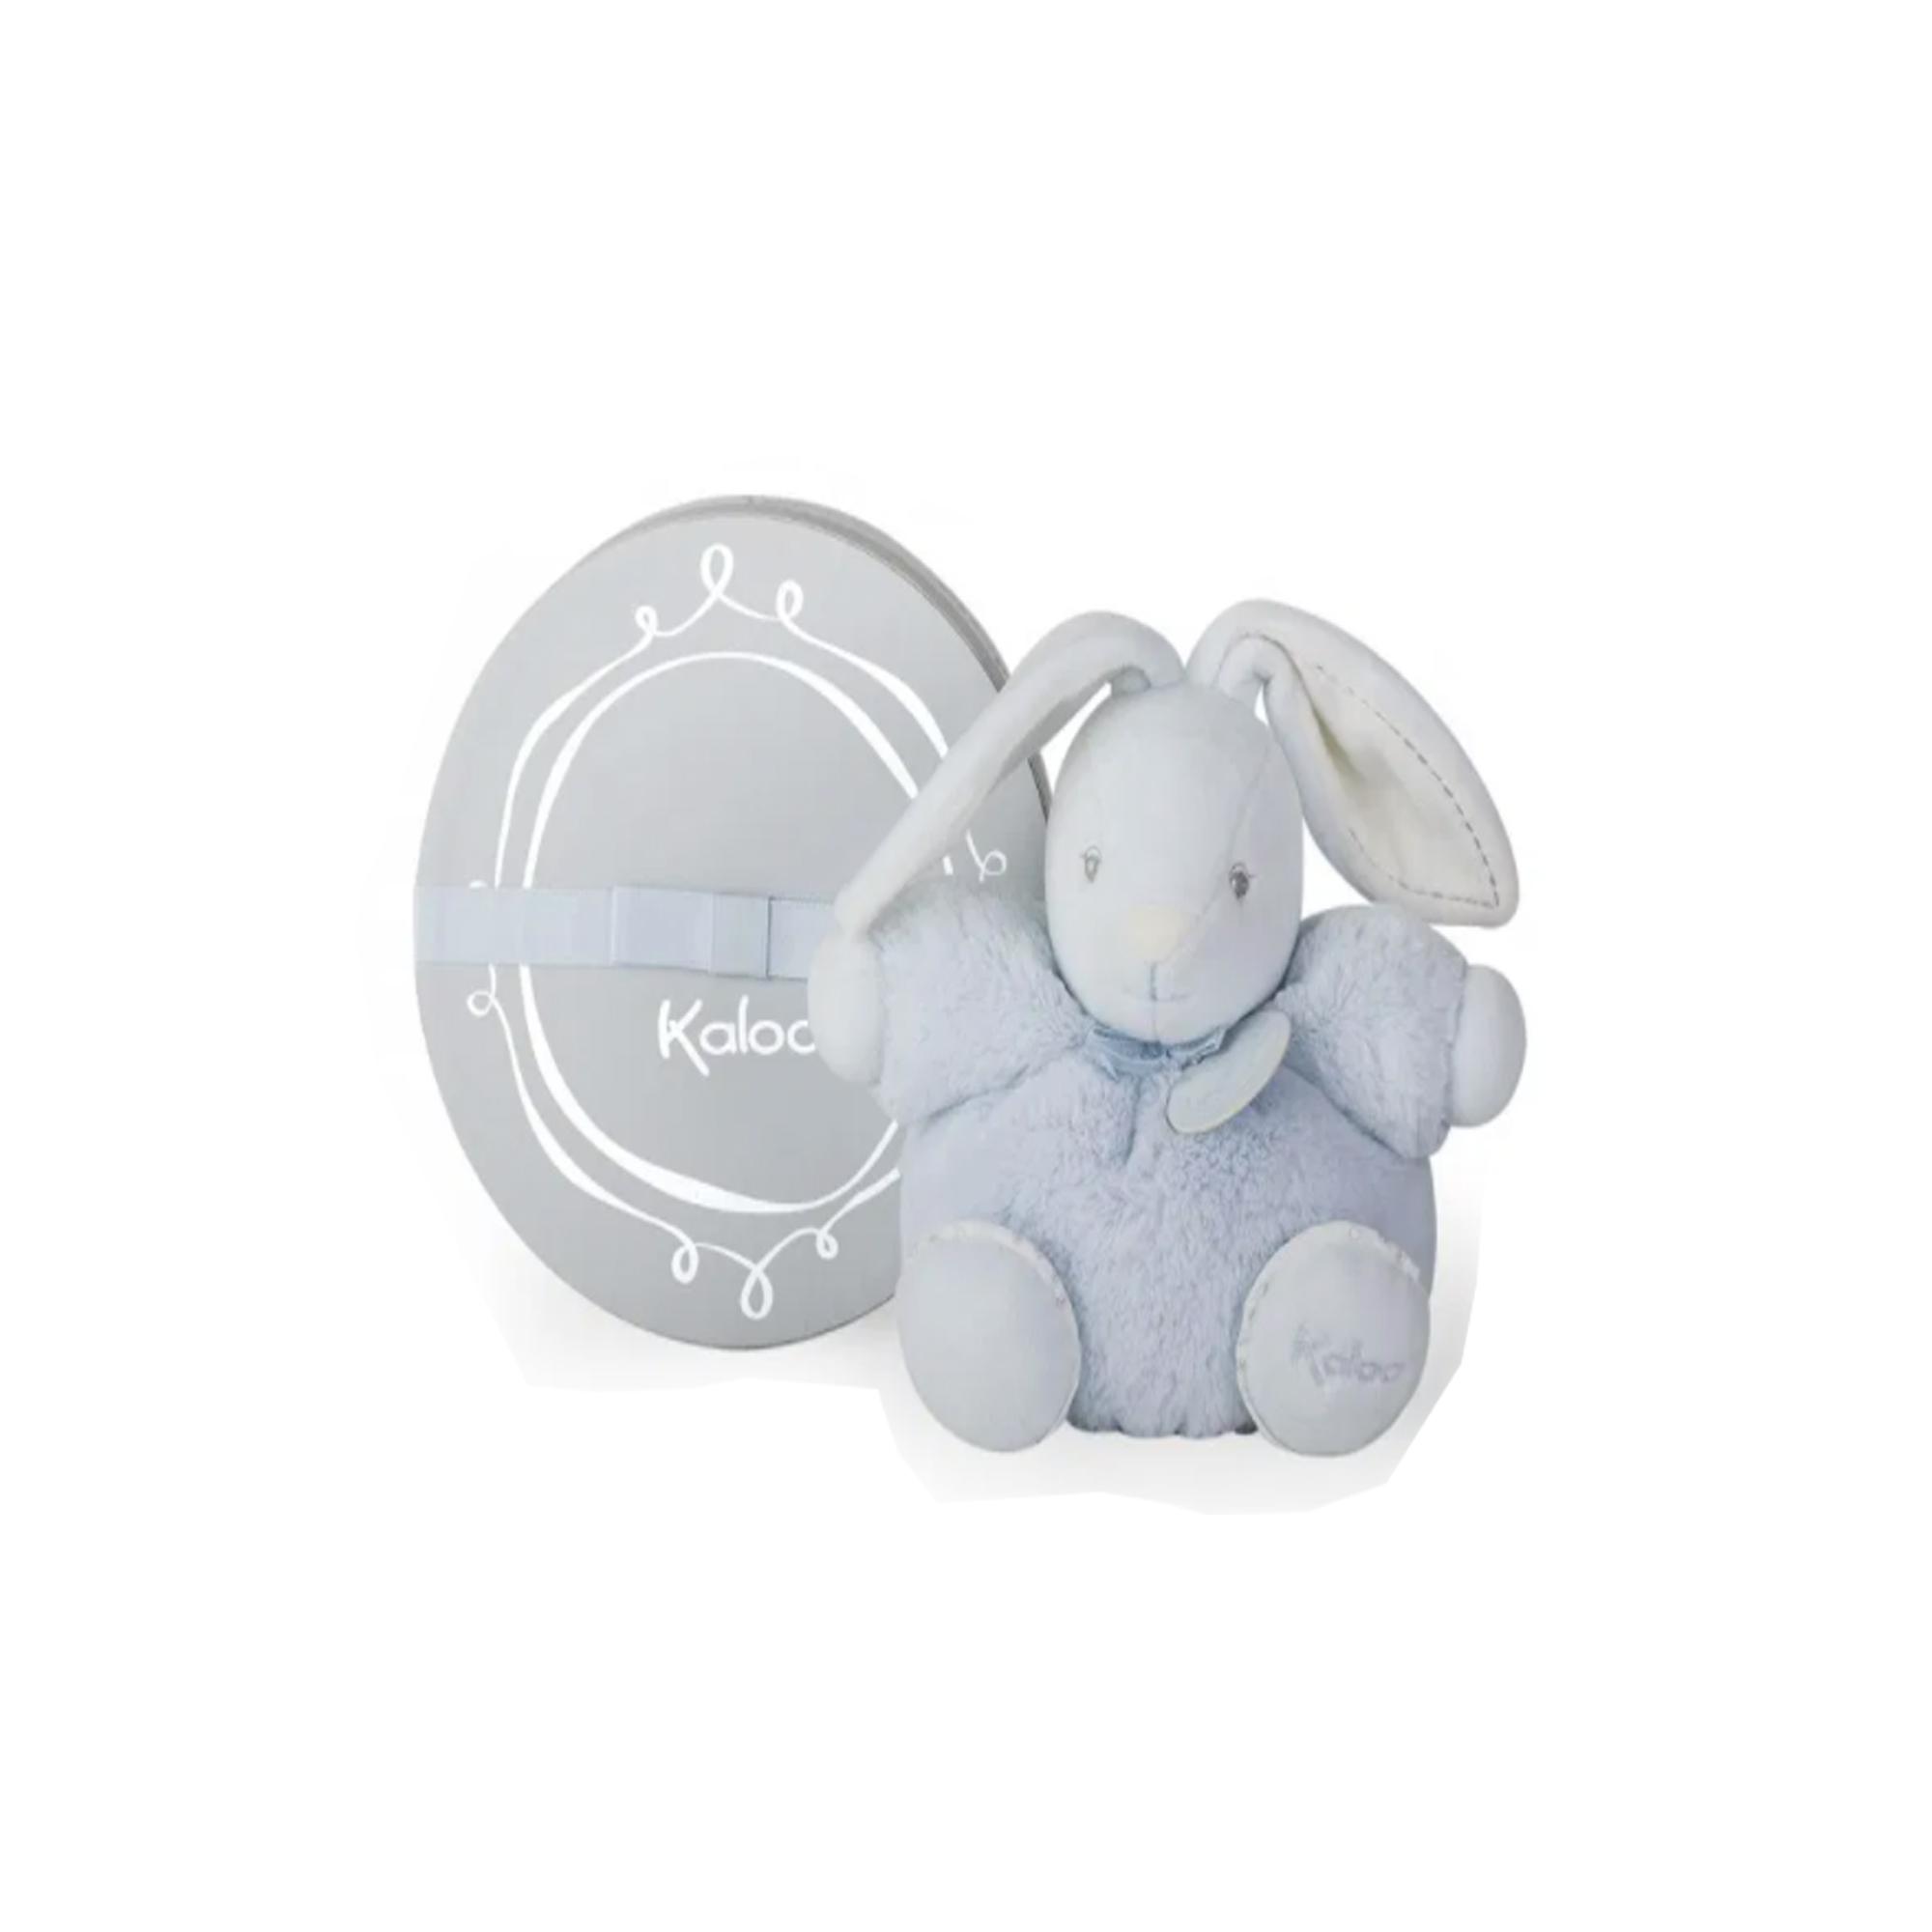 Kaloo Perle Chubby Rabbit Blue Small